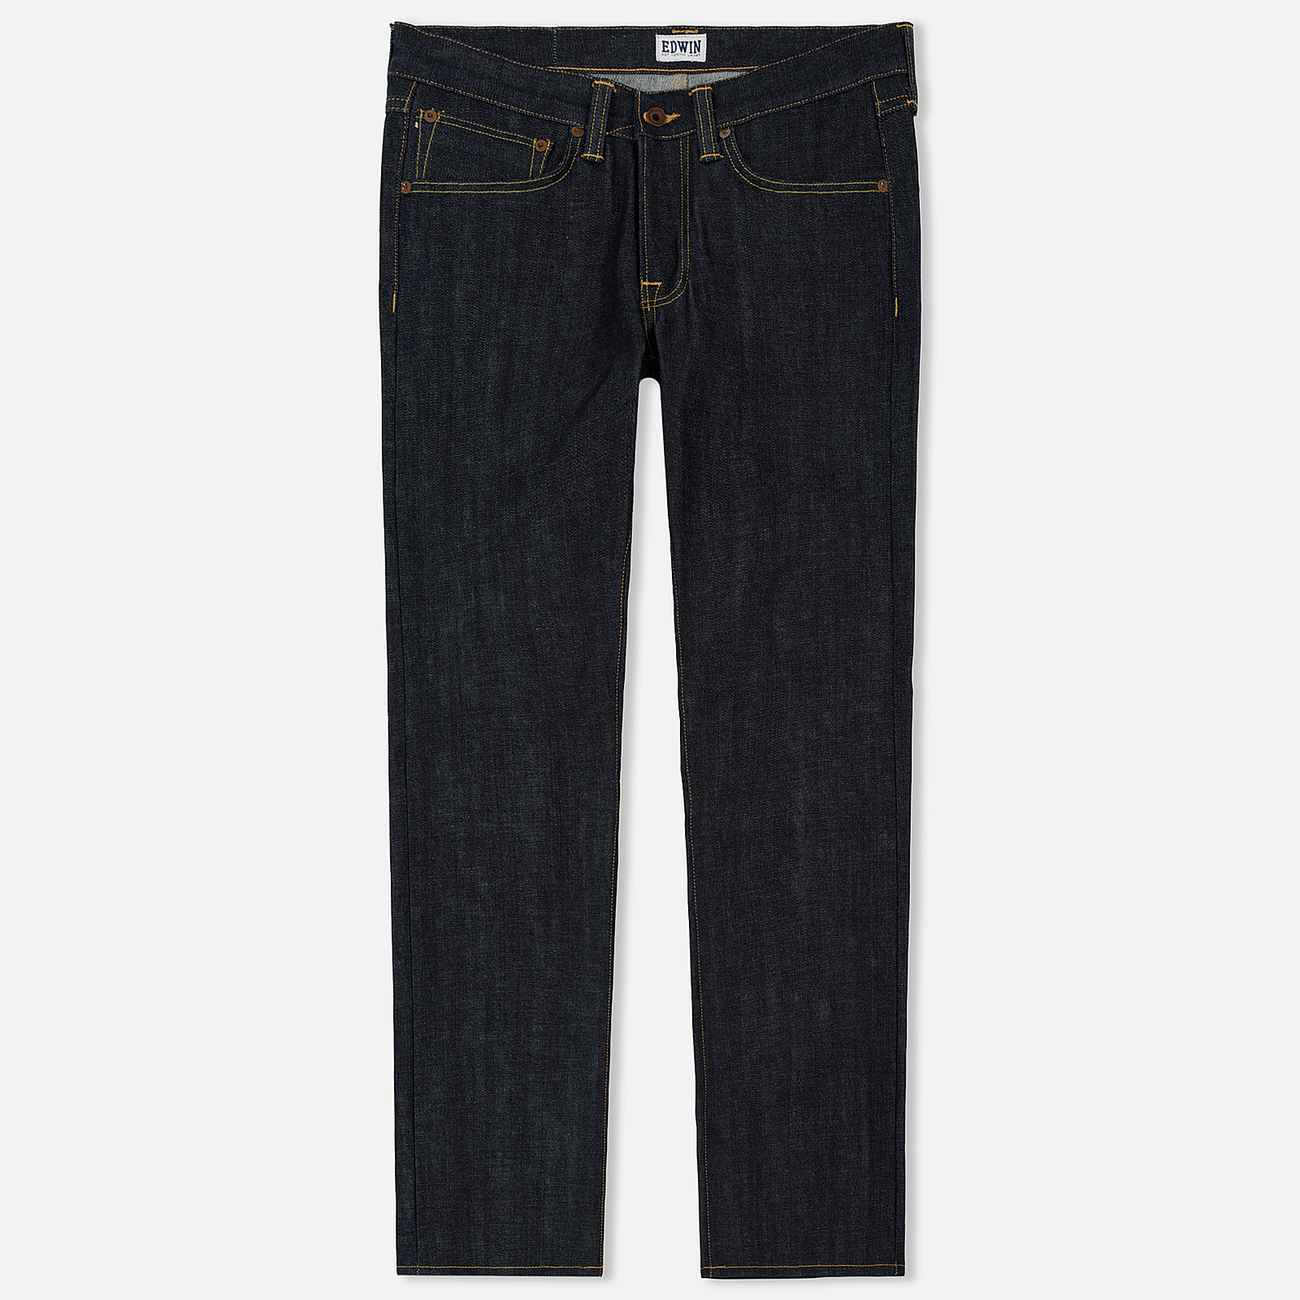 Мужские джинсы Edwin ED-47 Regular Straight Red Listed Selvage Blue Unwashed